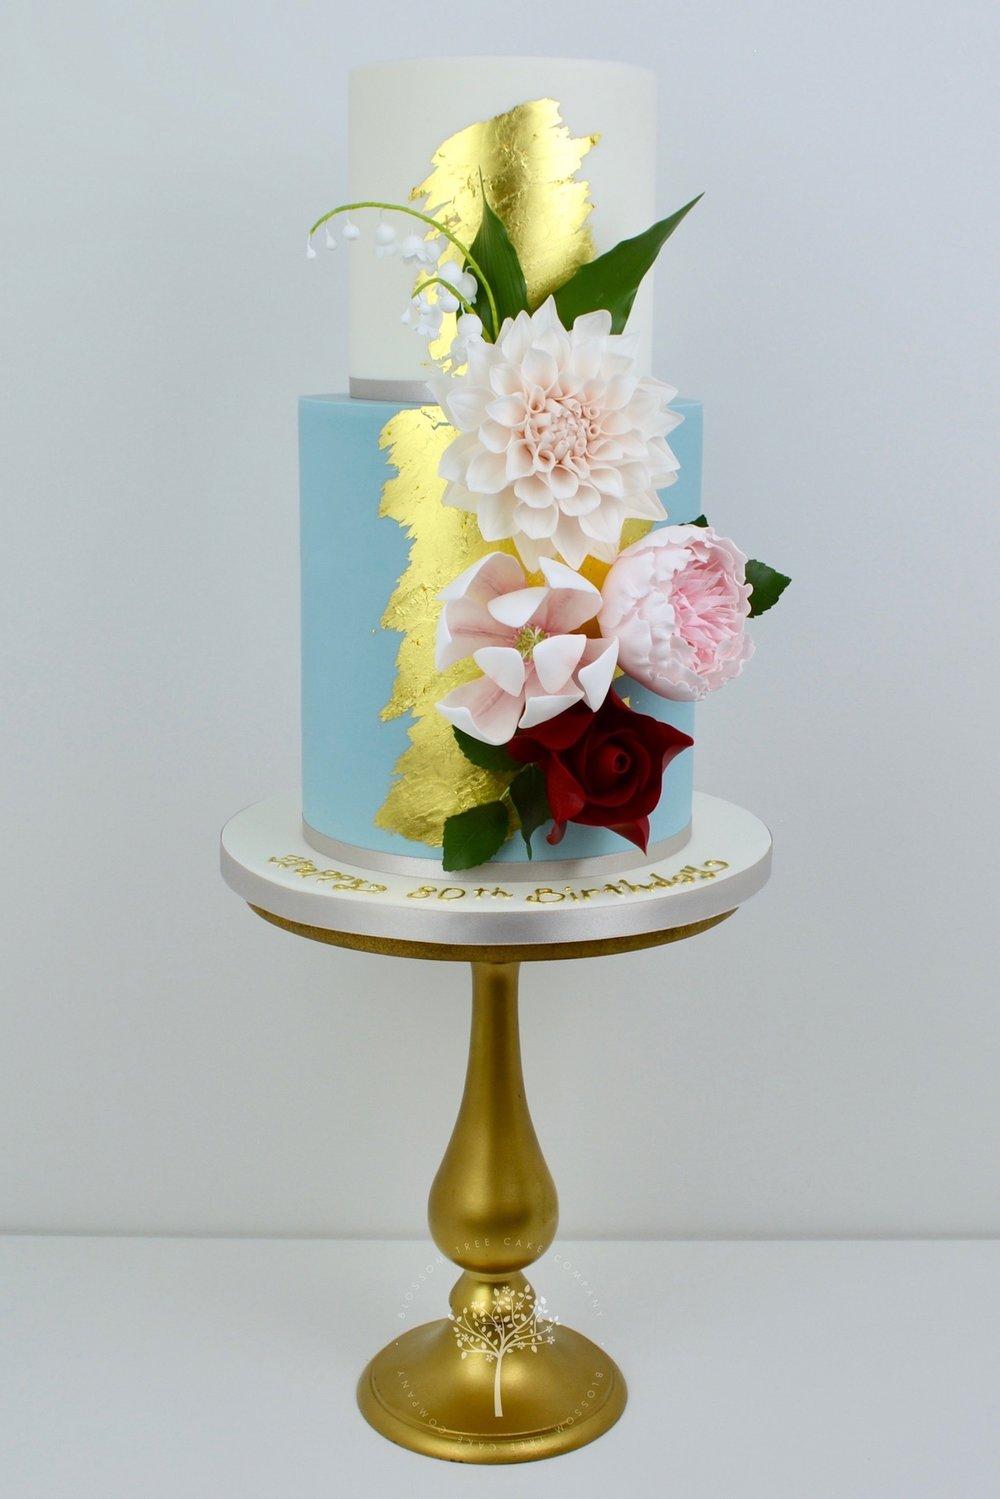 Cafe Au Lait Dahlia cake by Blossom Tree Cake Company Harrogate North Yorkshire.jpg